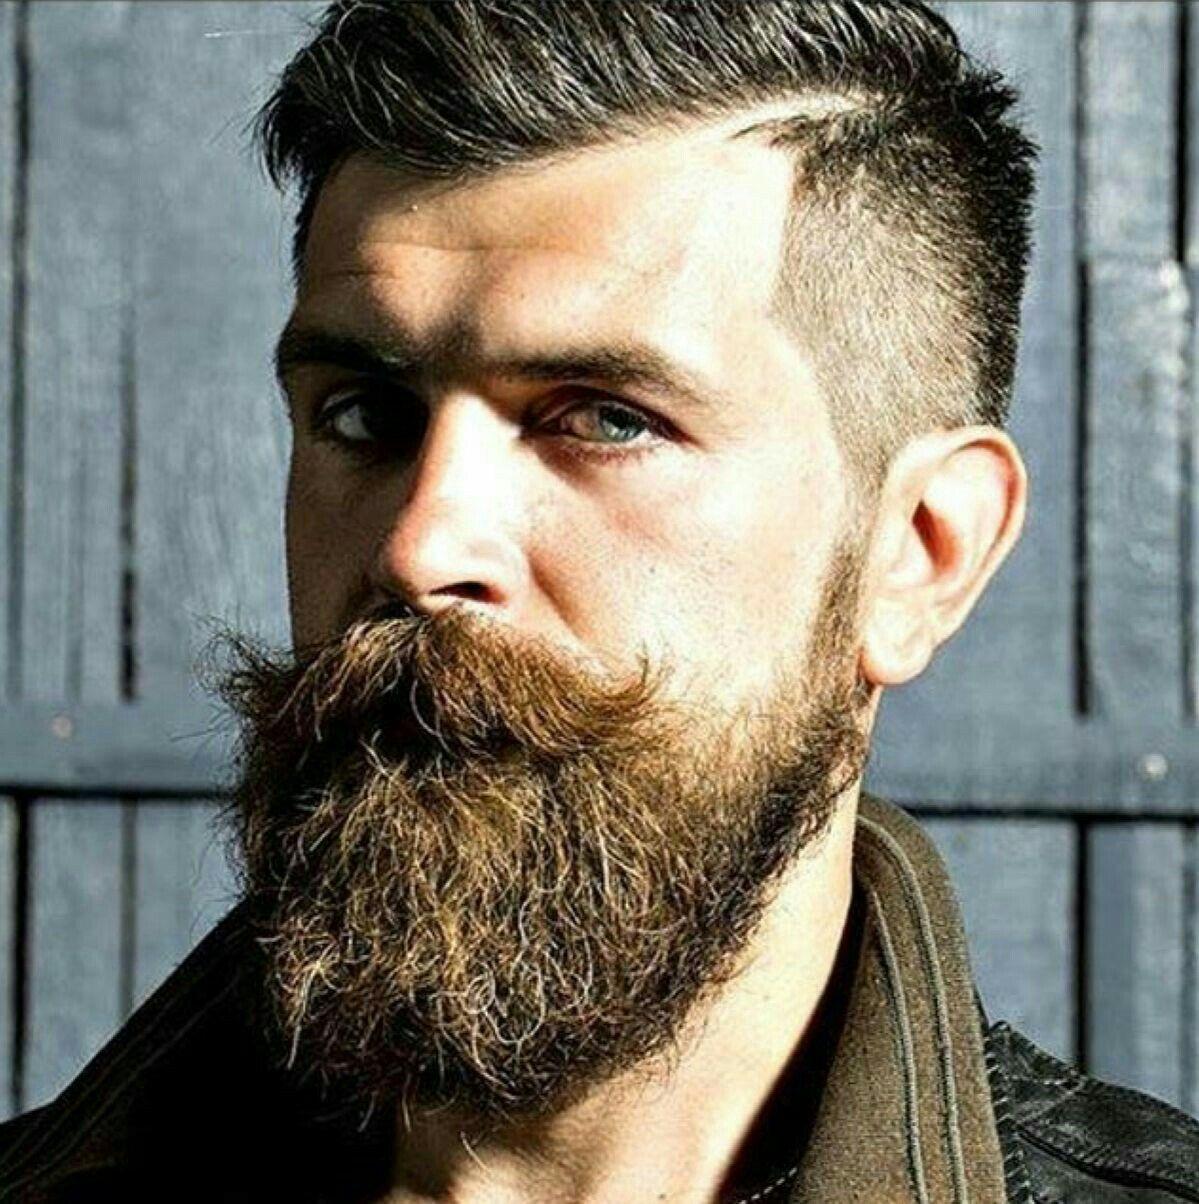 Pin By Panastasia On Beards Beard Styles For Men Long Beard Styles Hair And Beard Styles